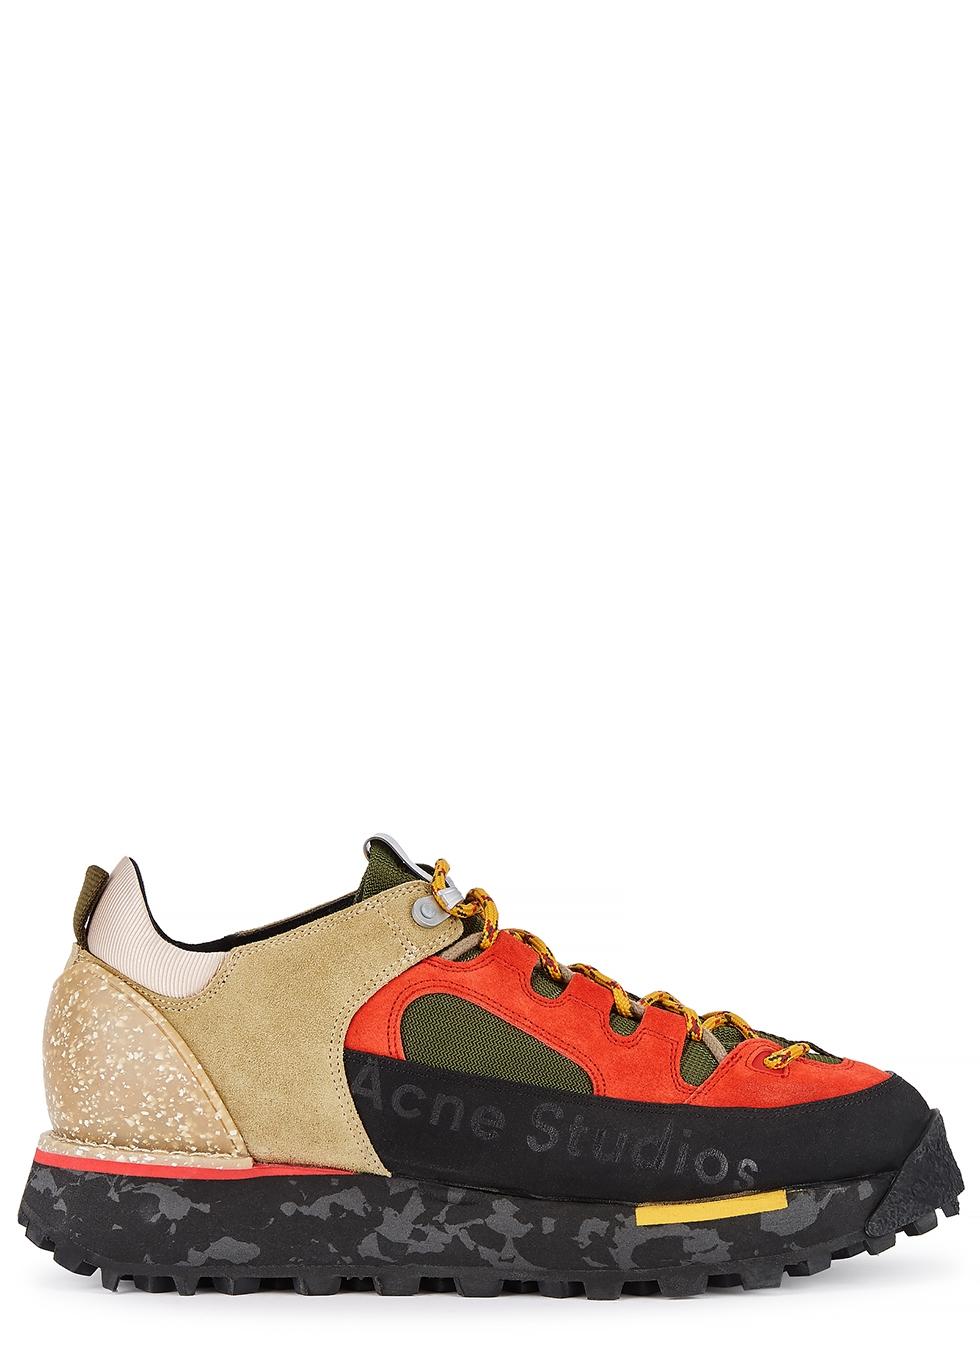 TrainersSneakersamp; Shoes Nichols Men's Designer Sports Harvey 8PkwOXn0